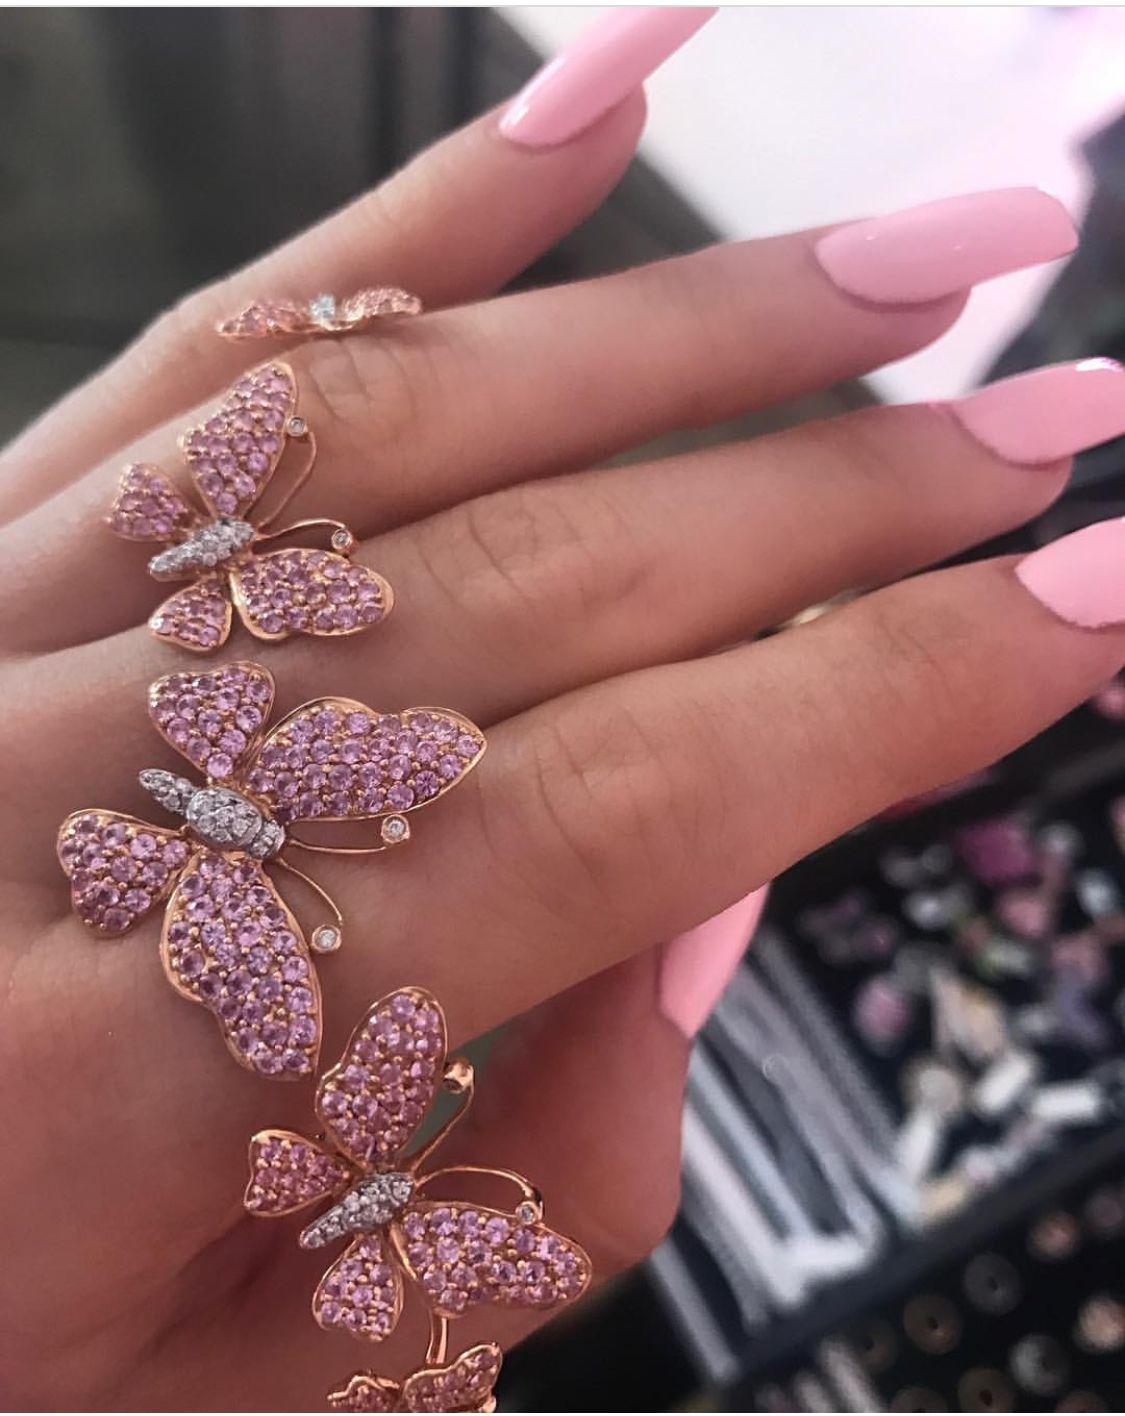 Nataliiaverteletska Pink Jewelry Pink Nails Kylie Jenner Nails